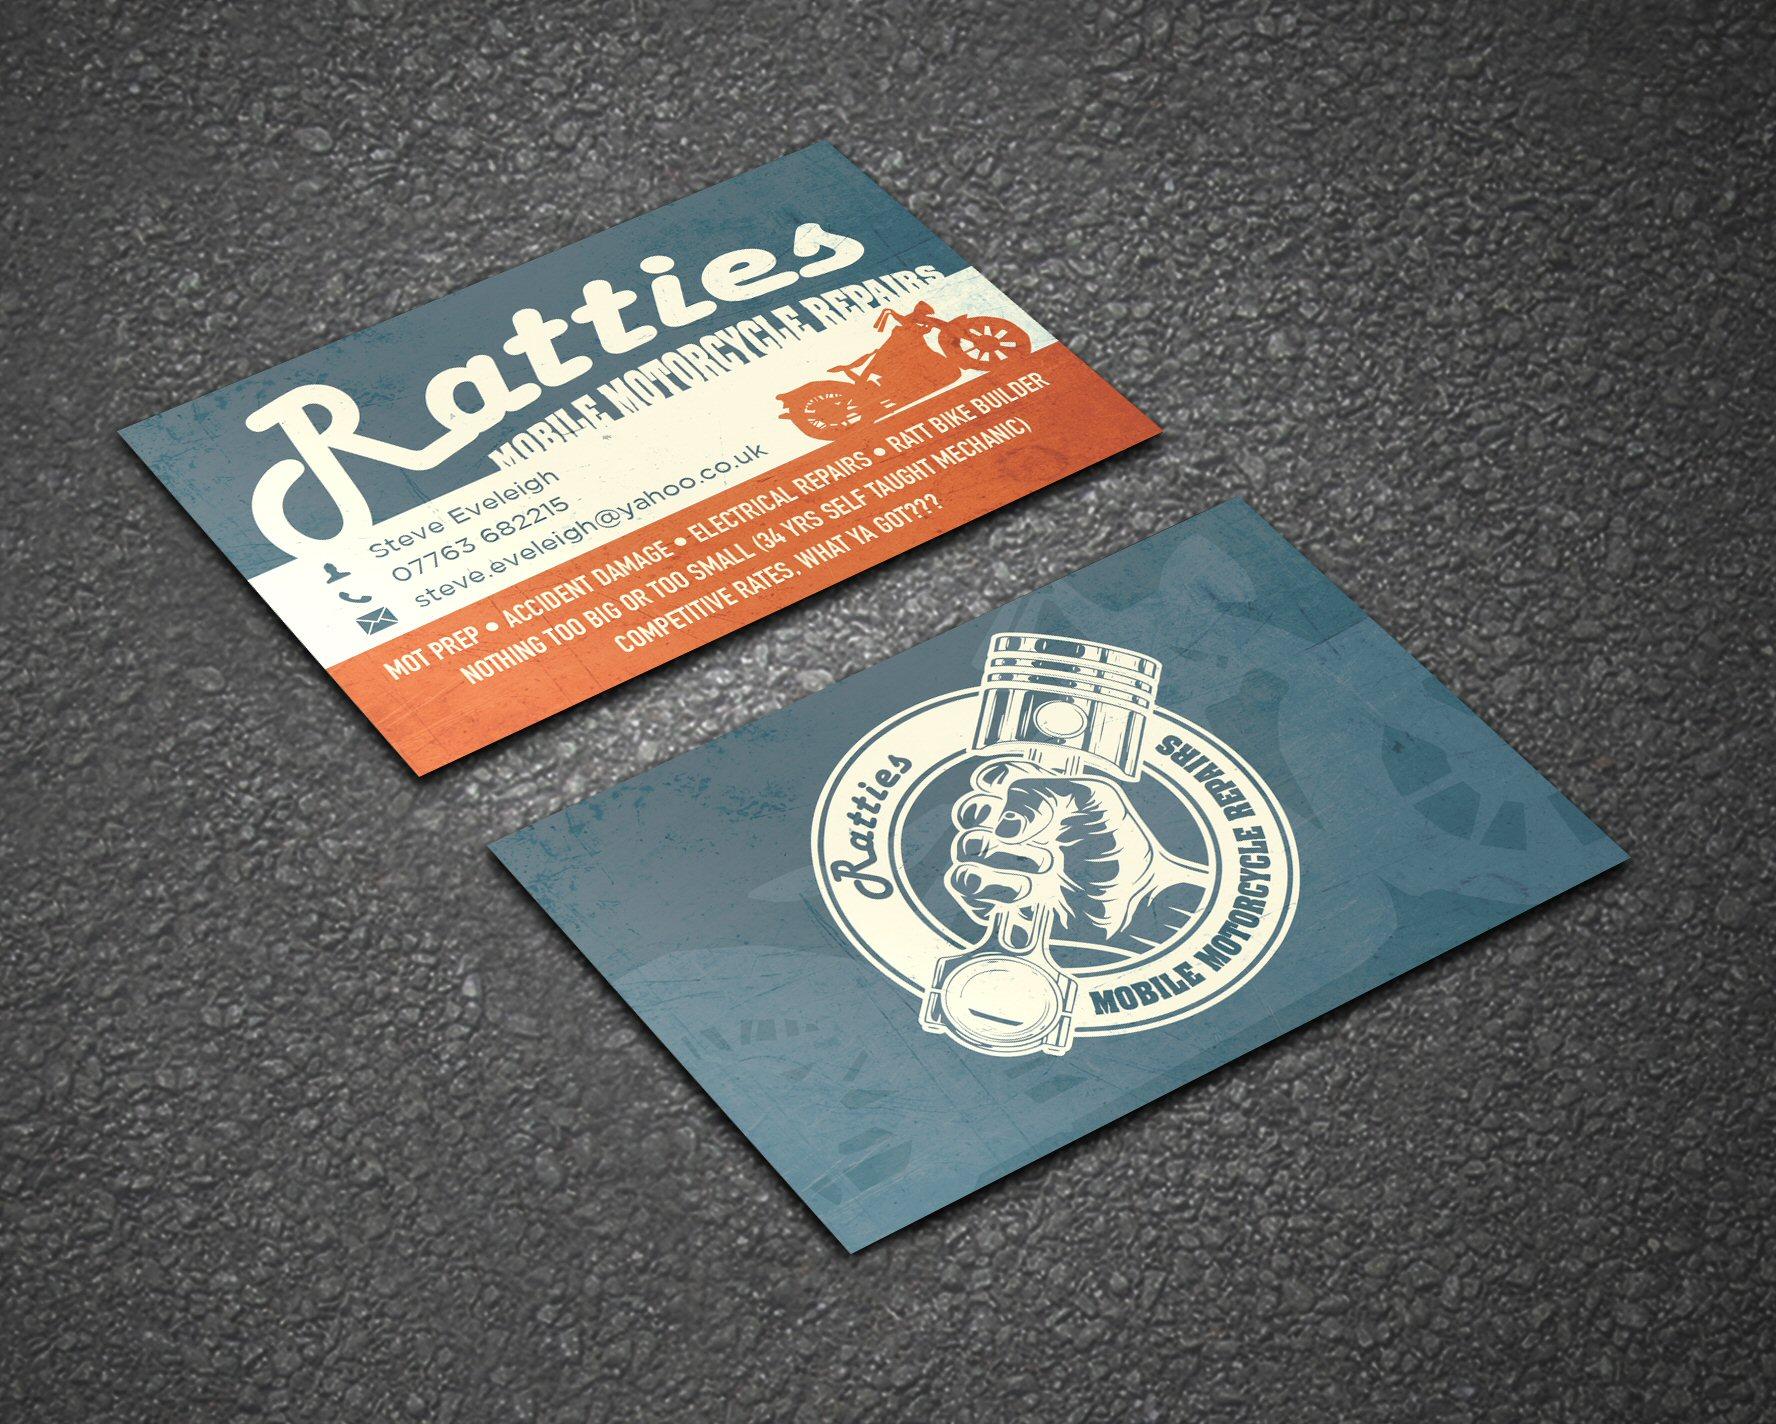 Ratties Business Card 3D copy